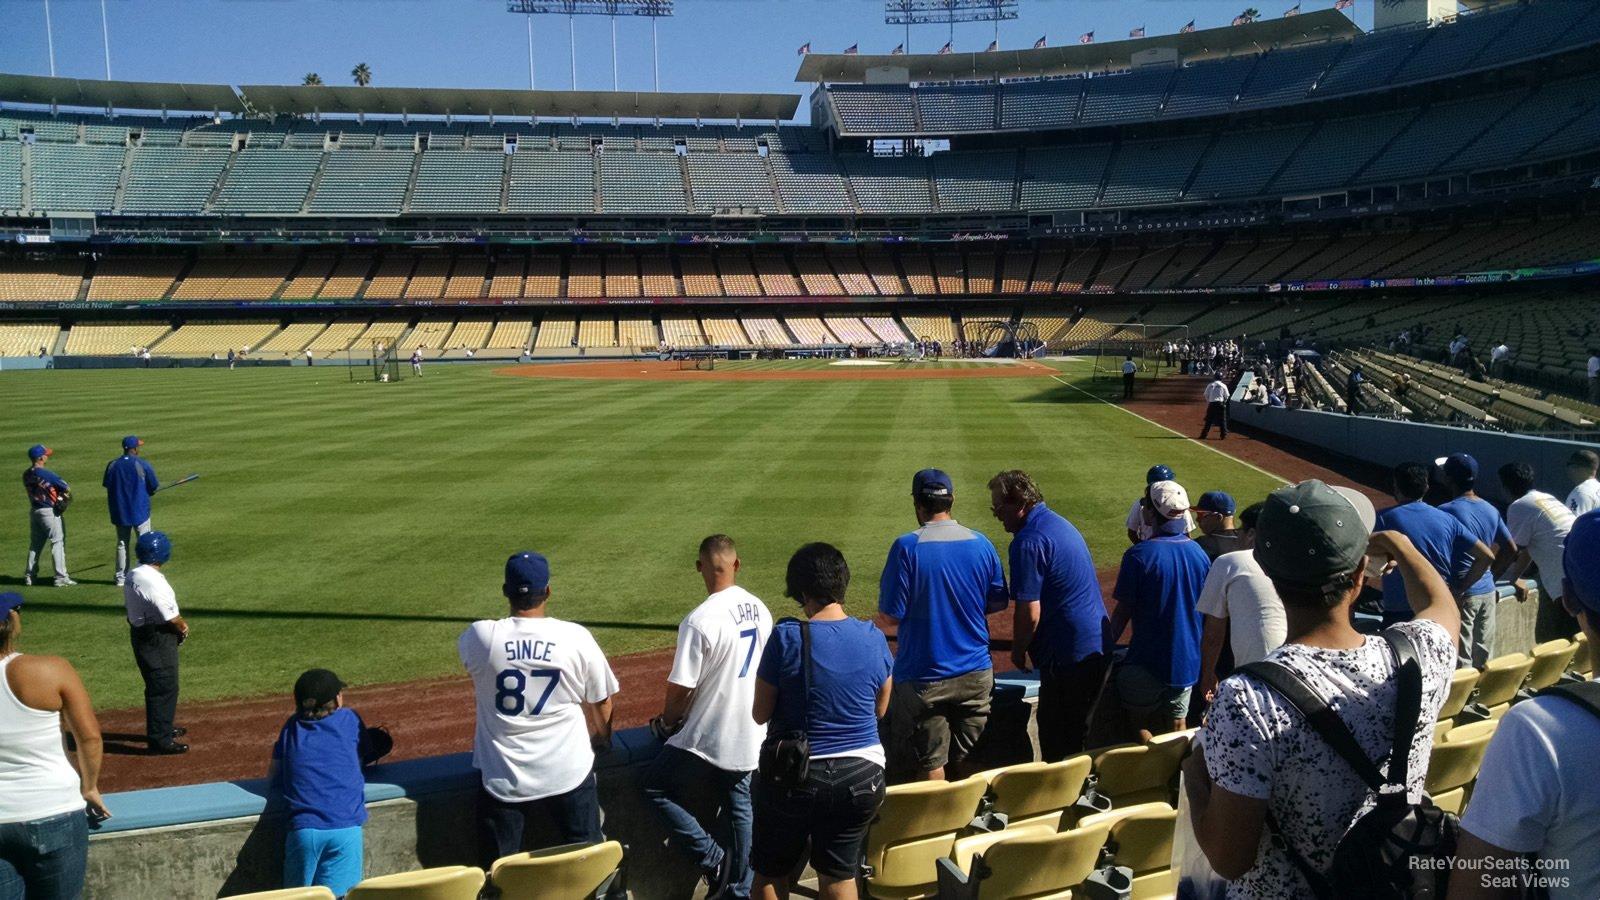 Dodger Stadium Section 53 - RateYourSeats.com